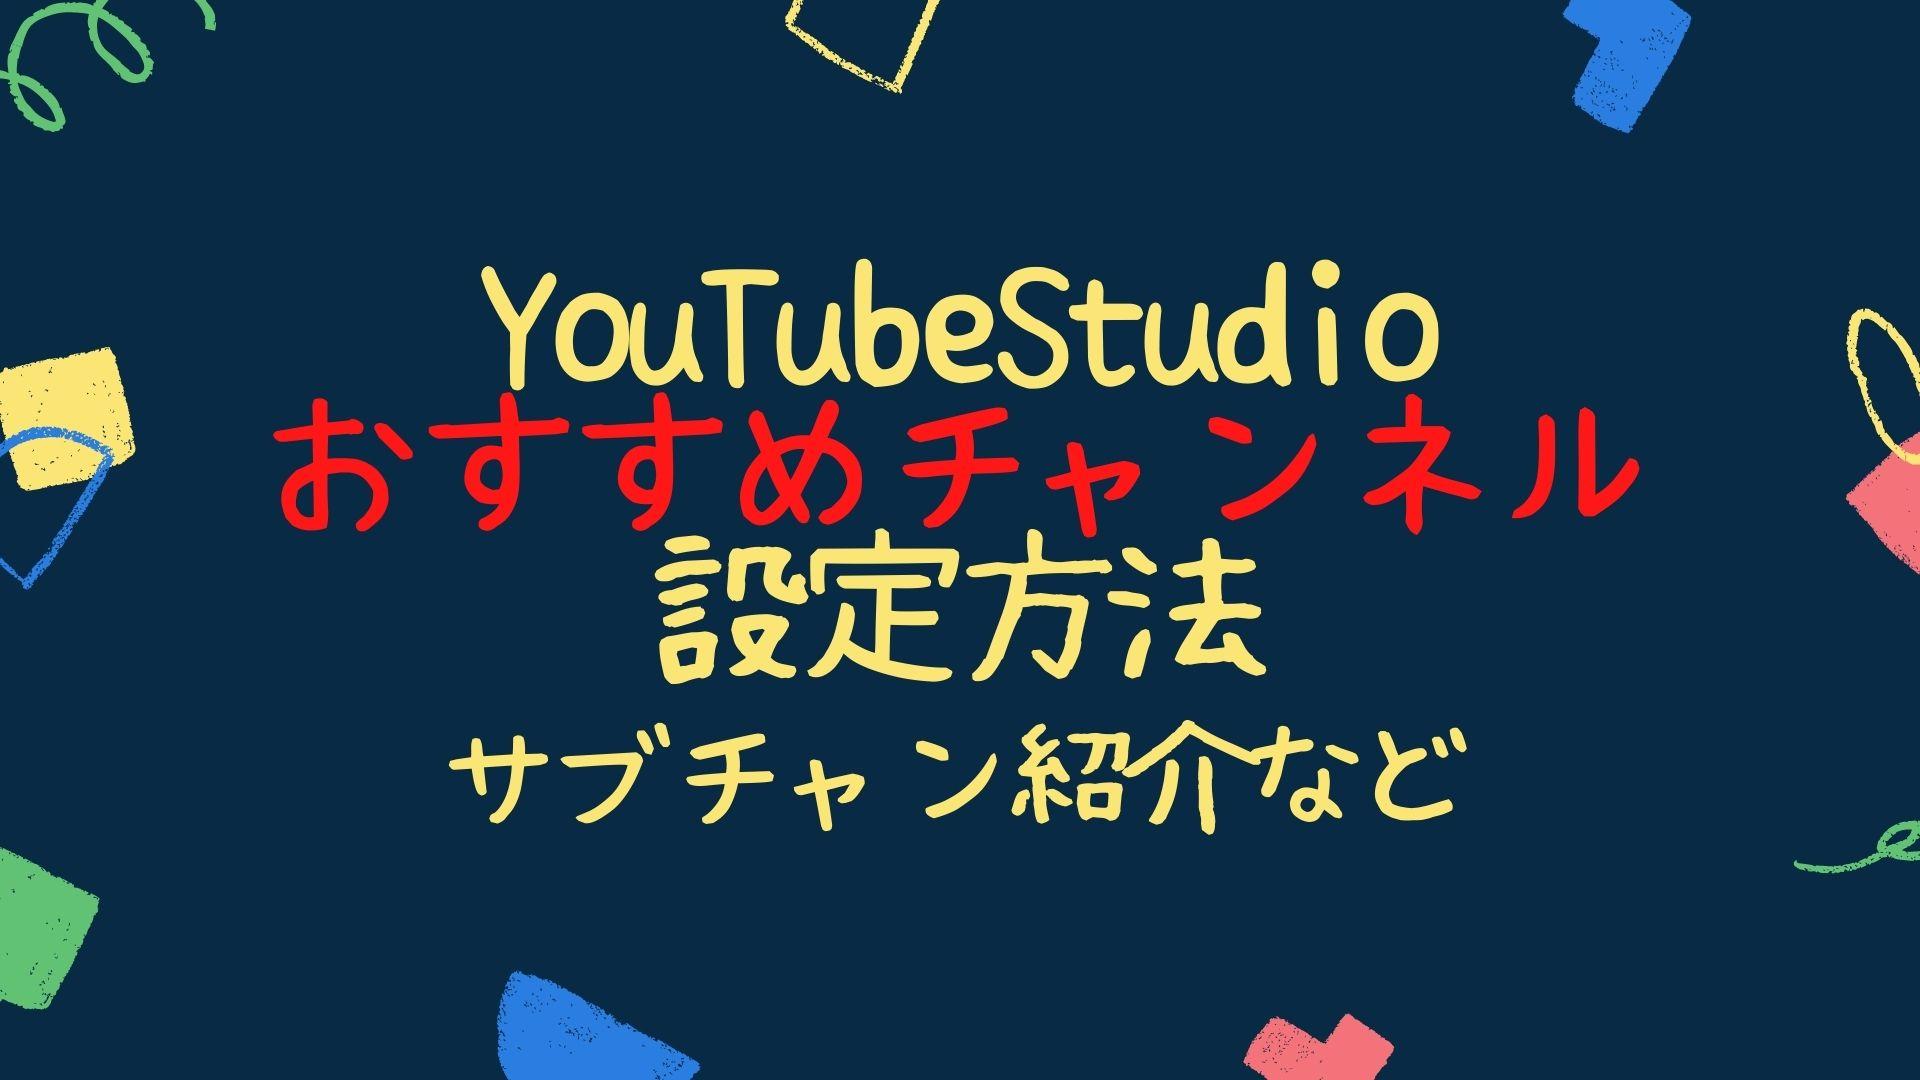 YouTubeStudio おすすめチャンネル設定方法サブチャン紹介など